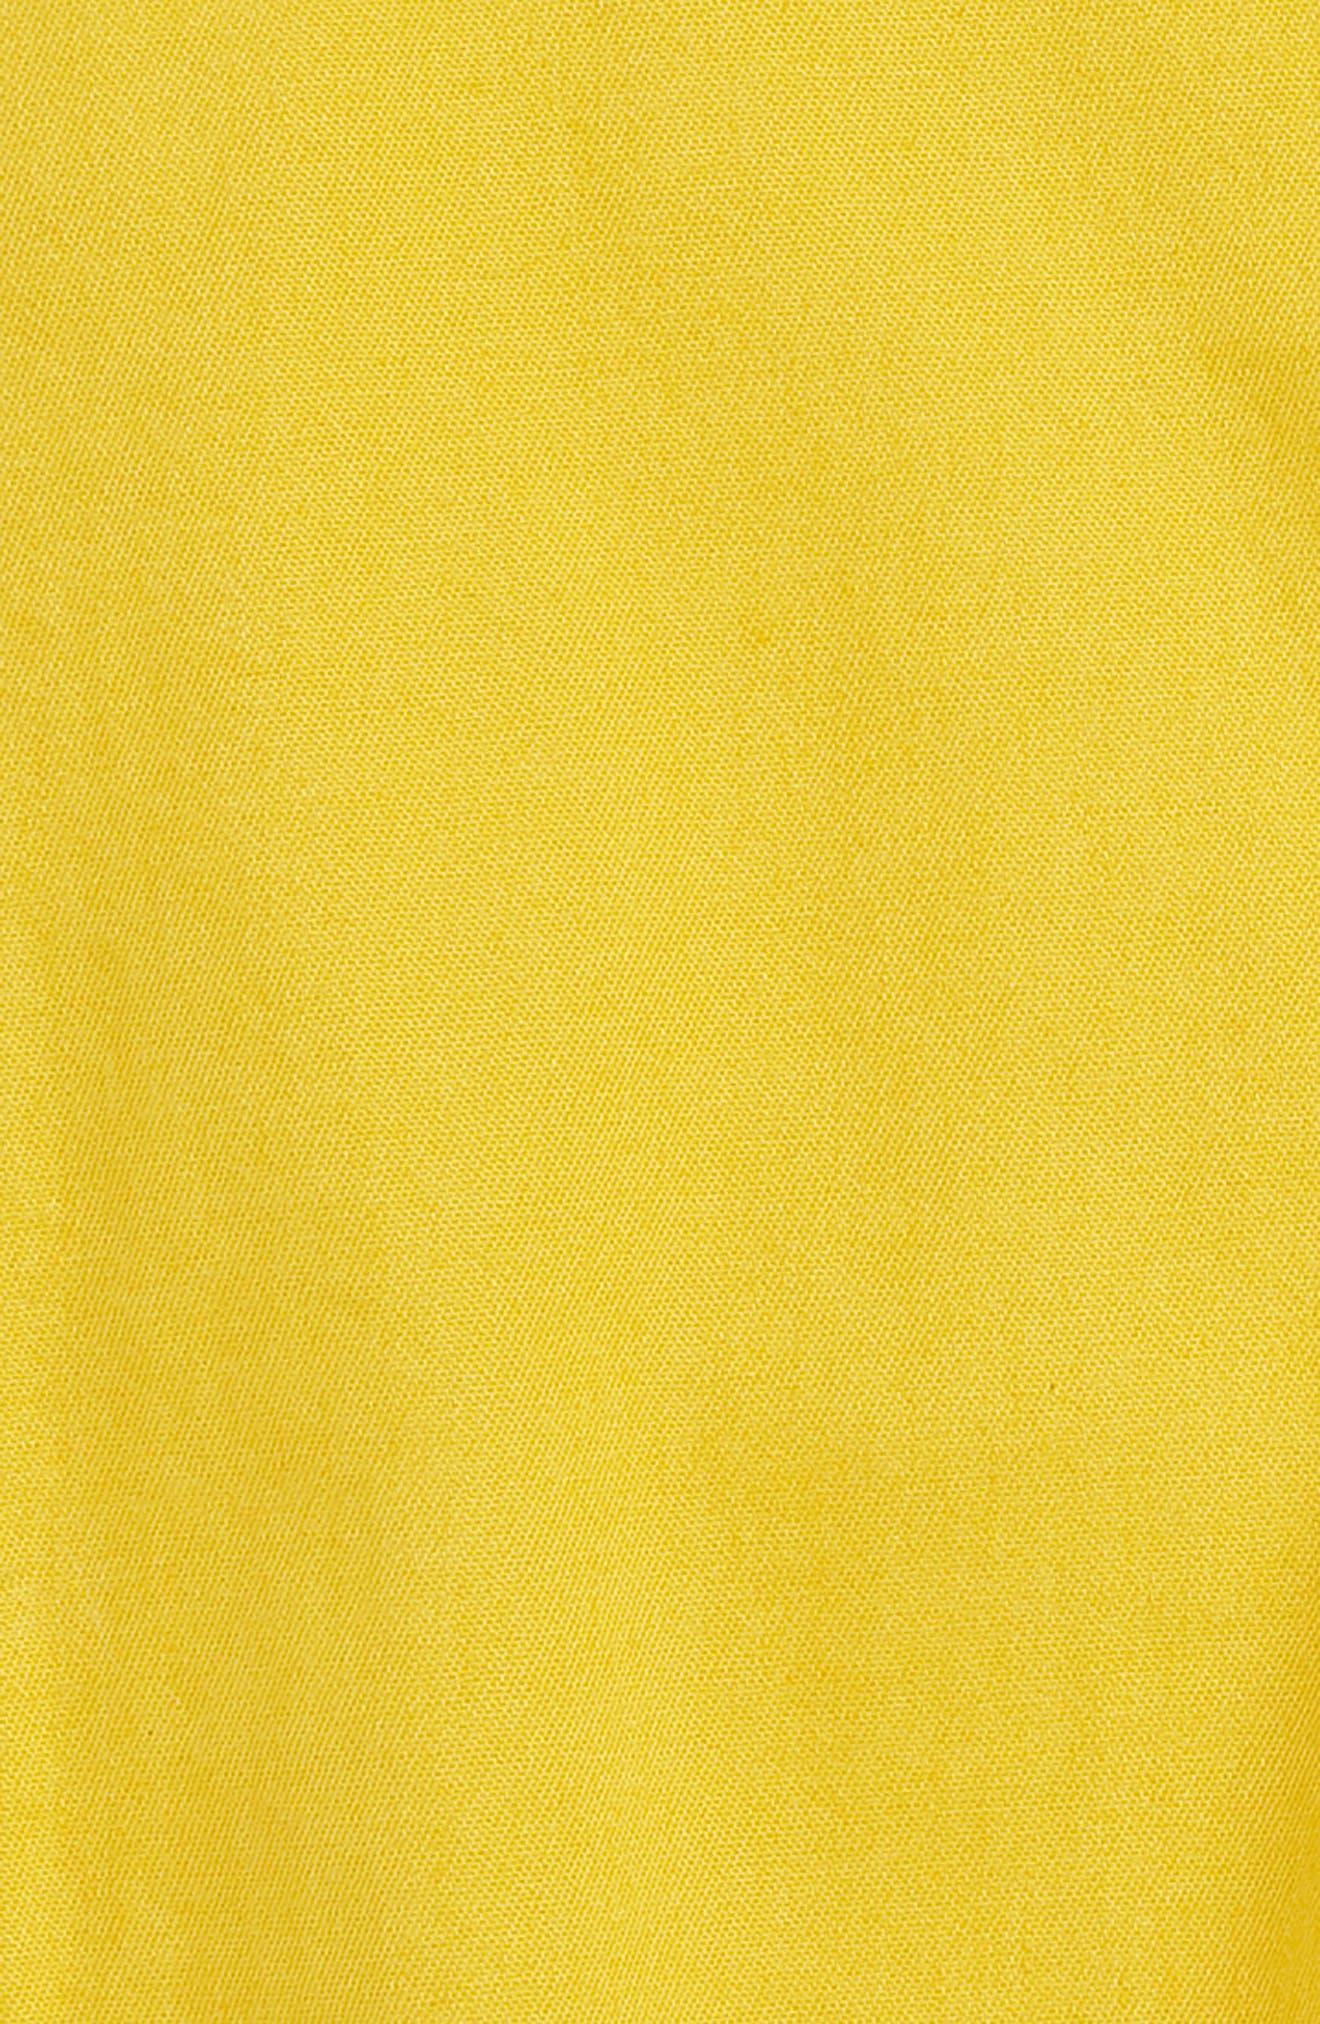 Colorful Chino Pants,                             Alternate thumbnail 2, color,                             YEL HONEYCOMB YELLOW